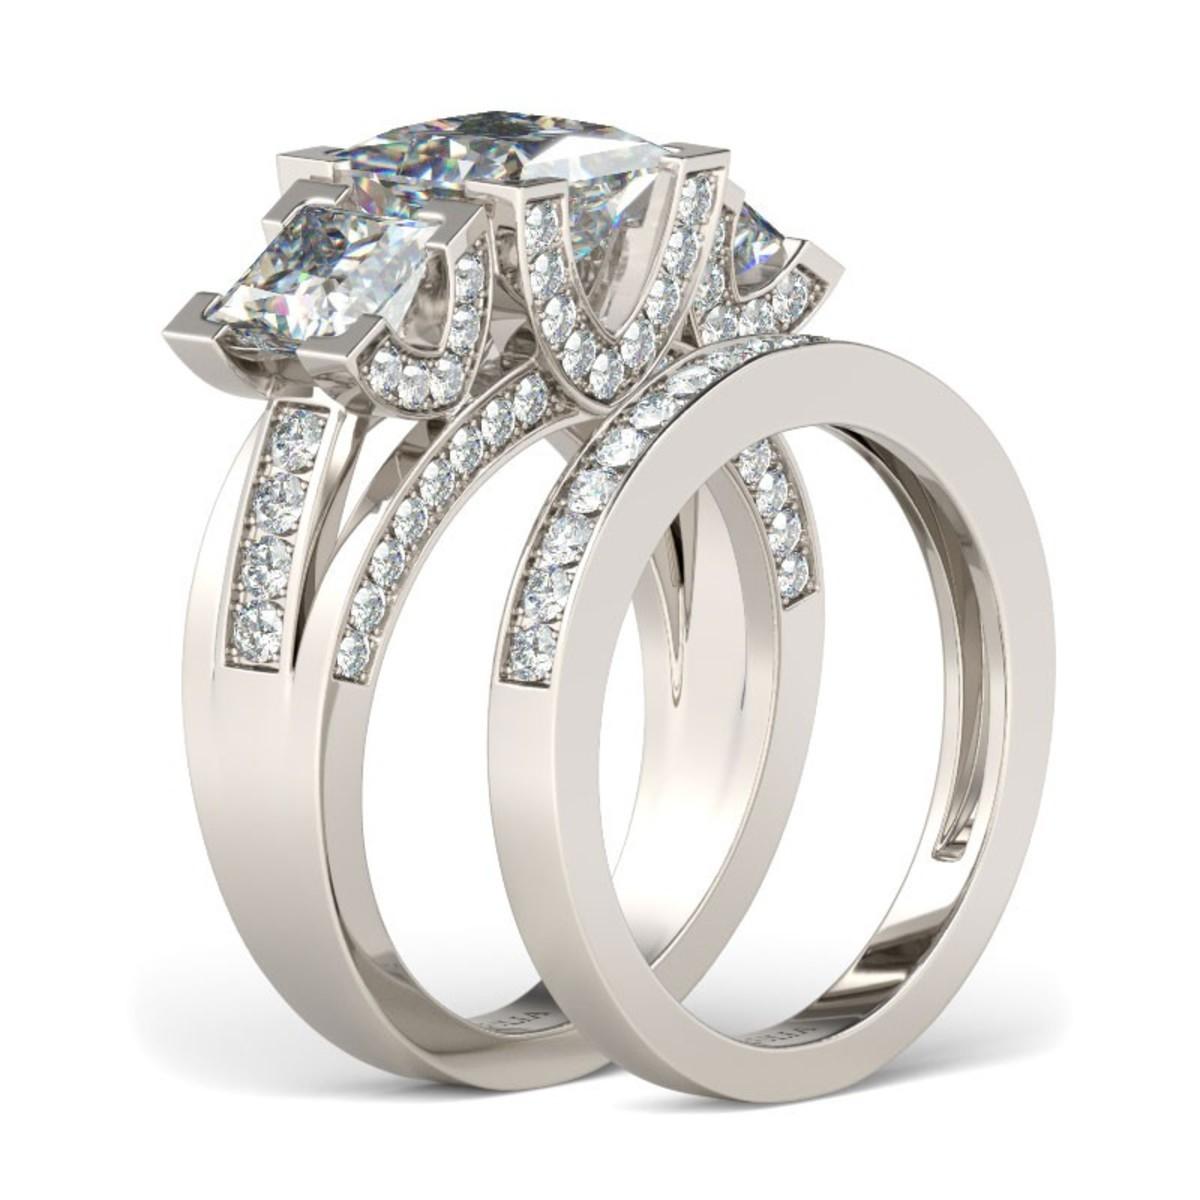 Rhodium-Plated 925 Sterling Silver Women's Wedding Ring